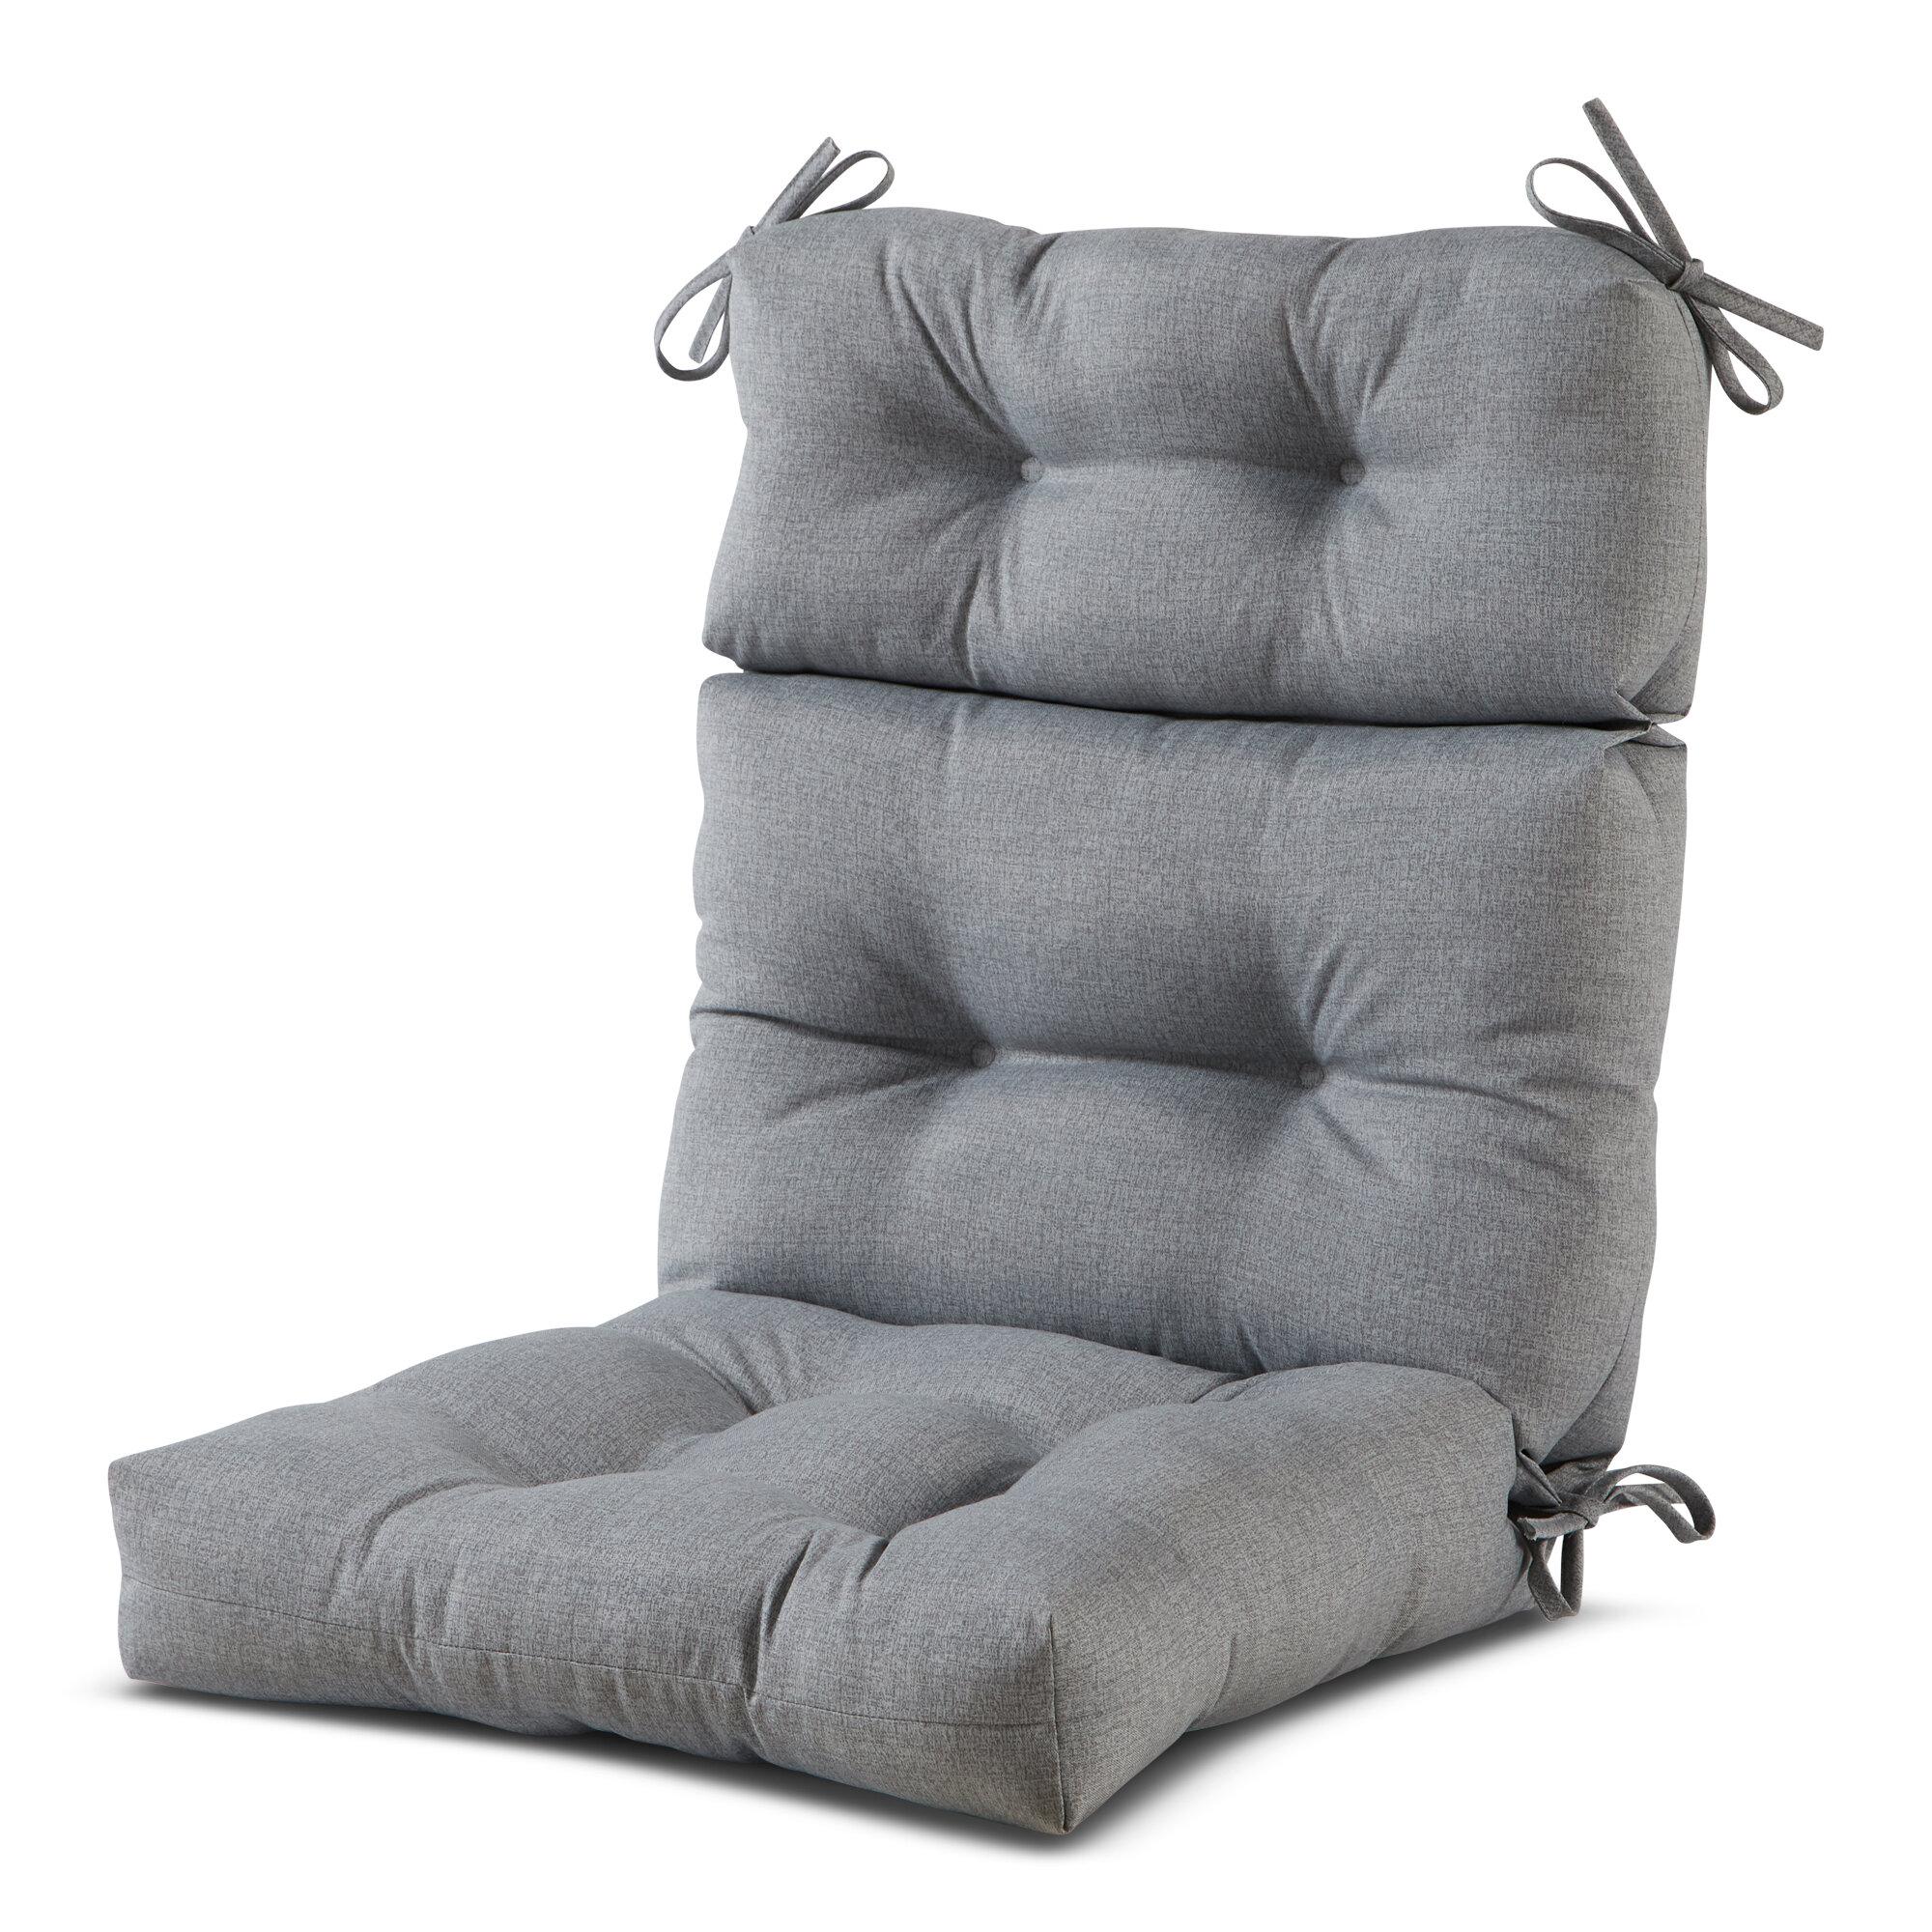 Ebern Designs High Back Outdoor Lounge Chair Cushion Reviews Wayfair